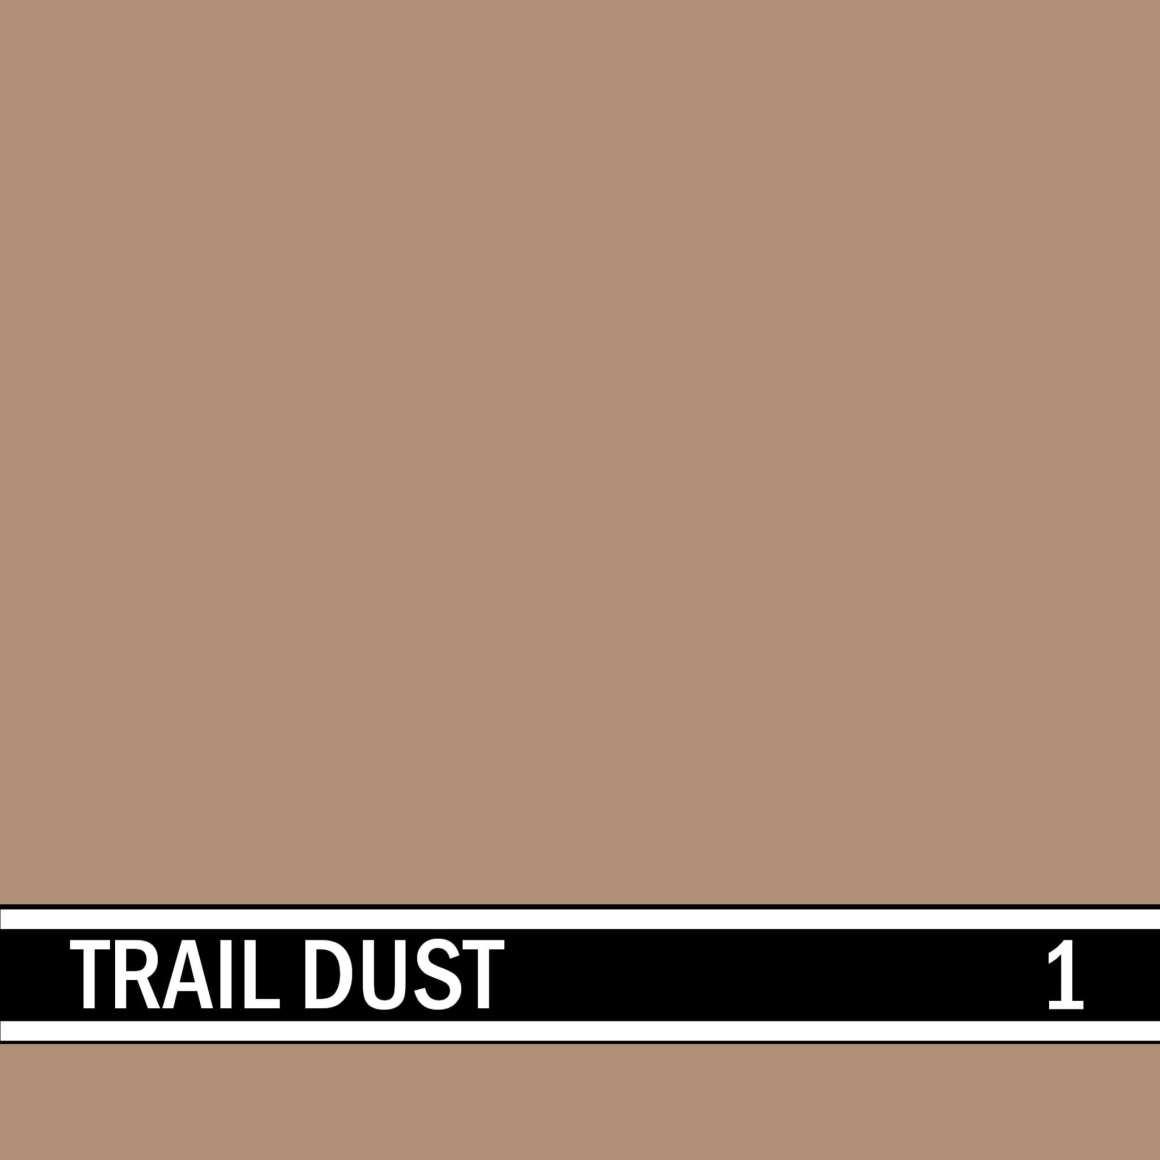 Trail Dust integral concrete color for stamped concrete and decorative colored concrete